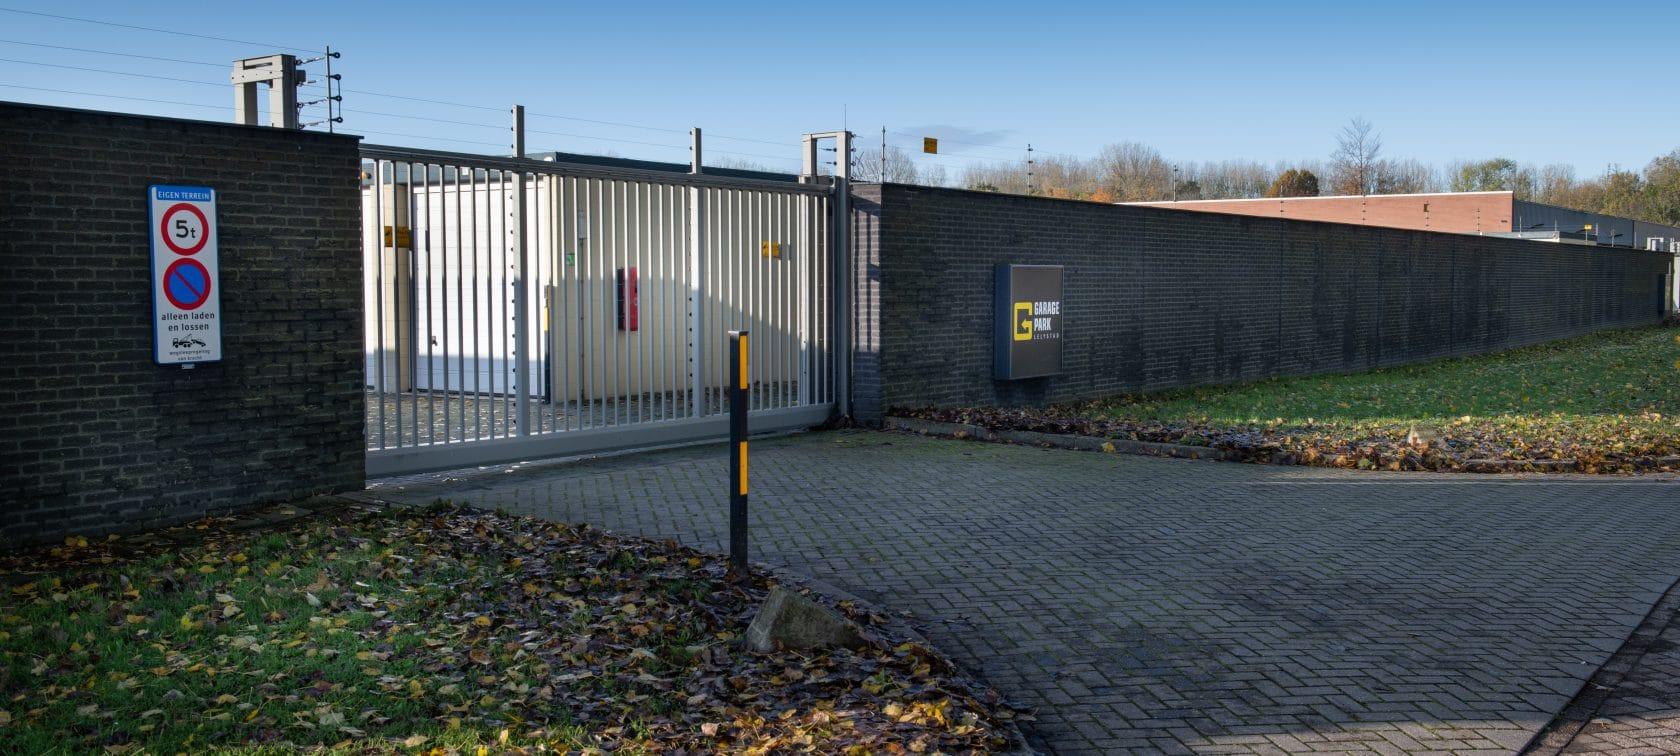 GaragePark Lelystad - Garageboxen Lelystad